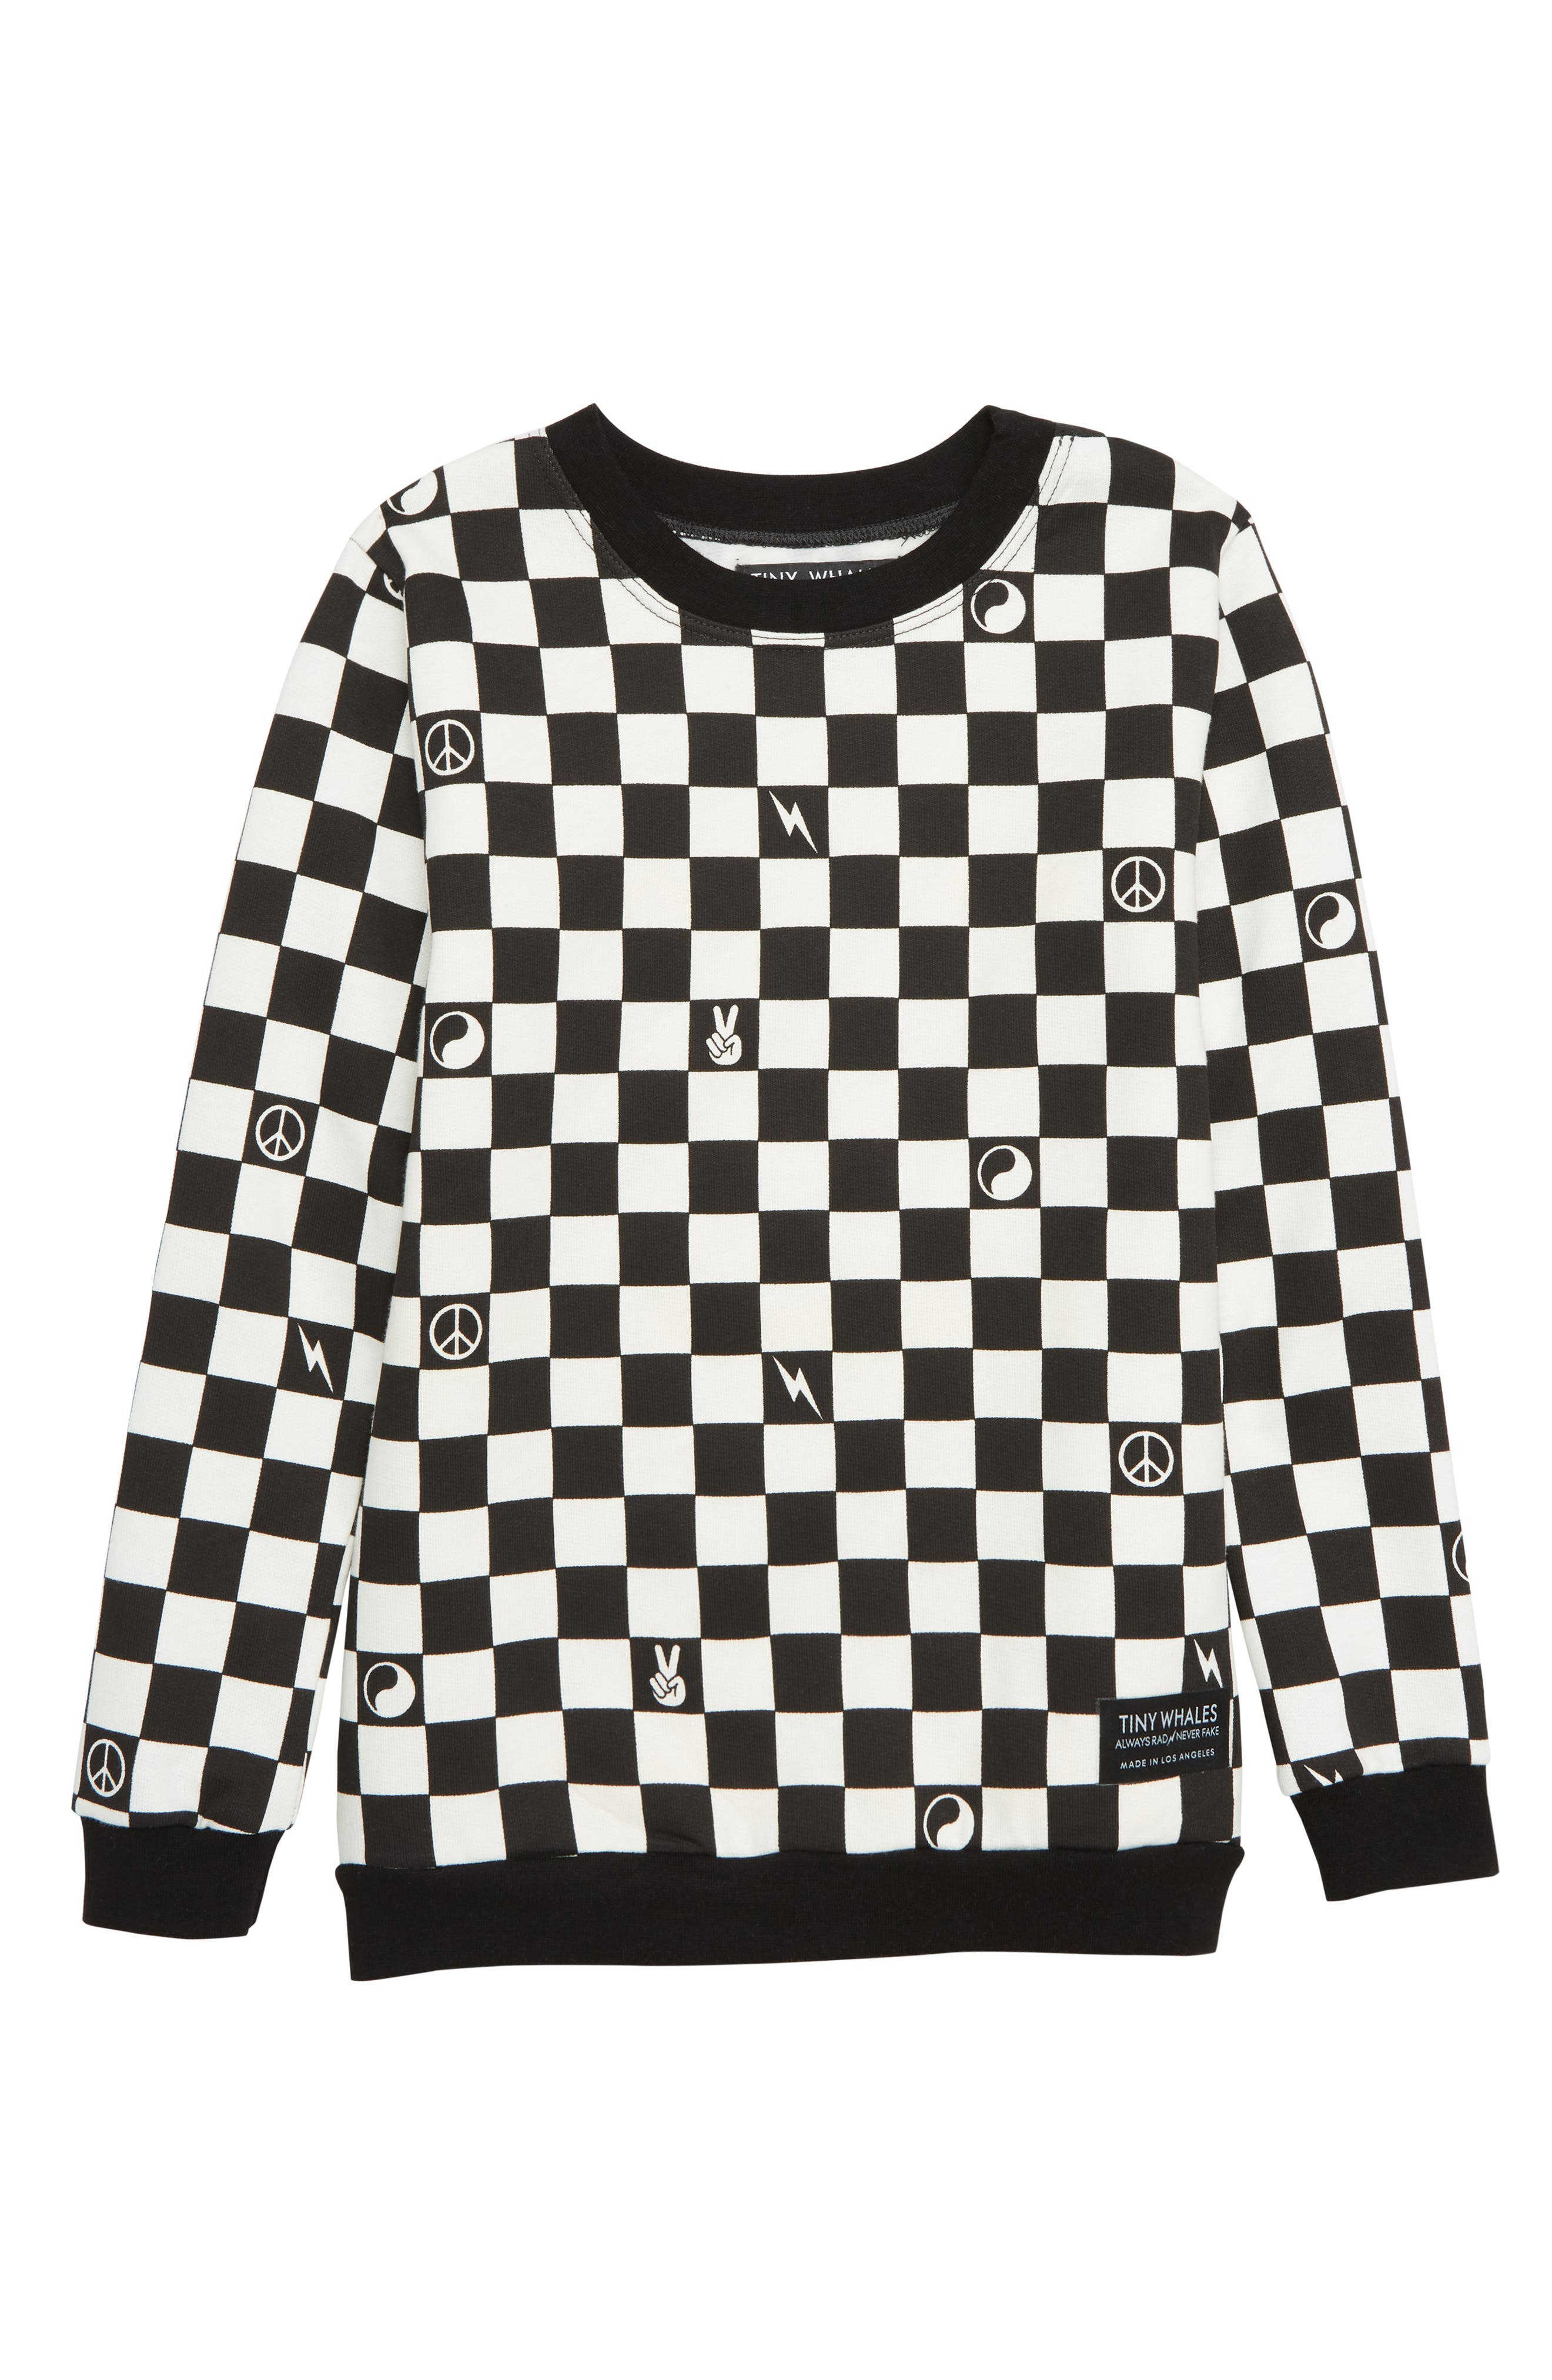 Boys Tiny Whales Checker Sweatshirt Size 10Y  Black